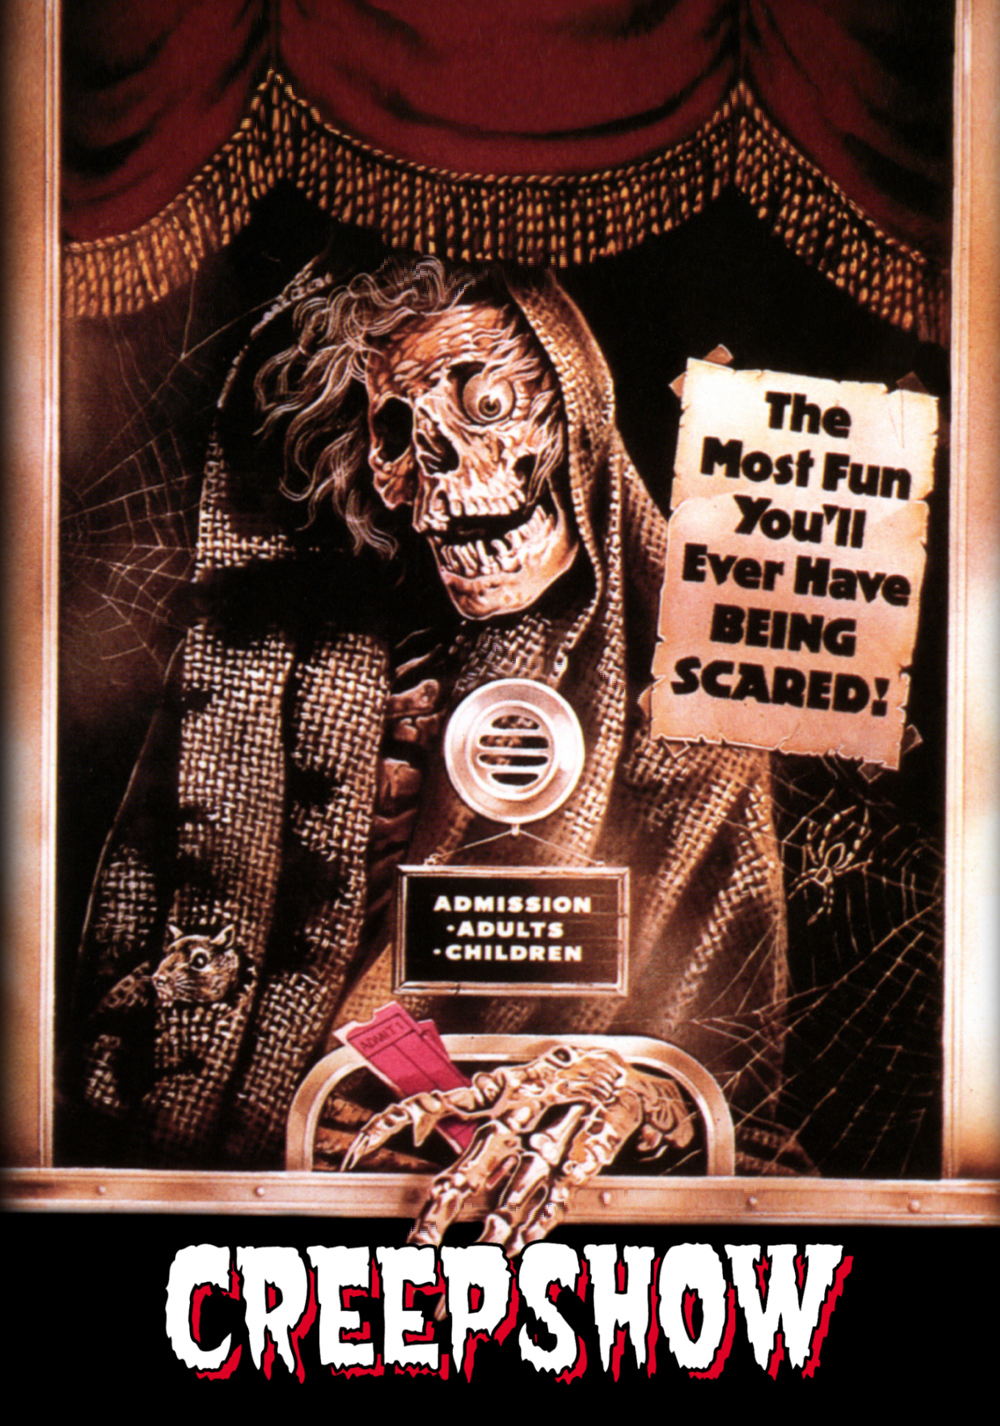 Creepshow Movie Poster Creepshow Movie Poster Image